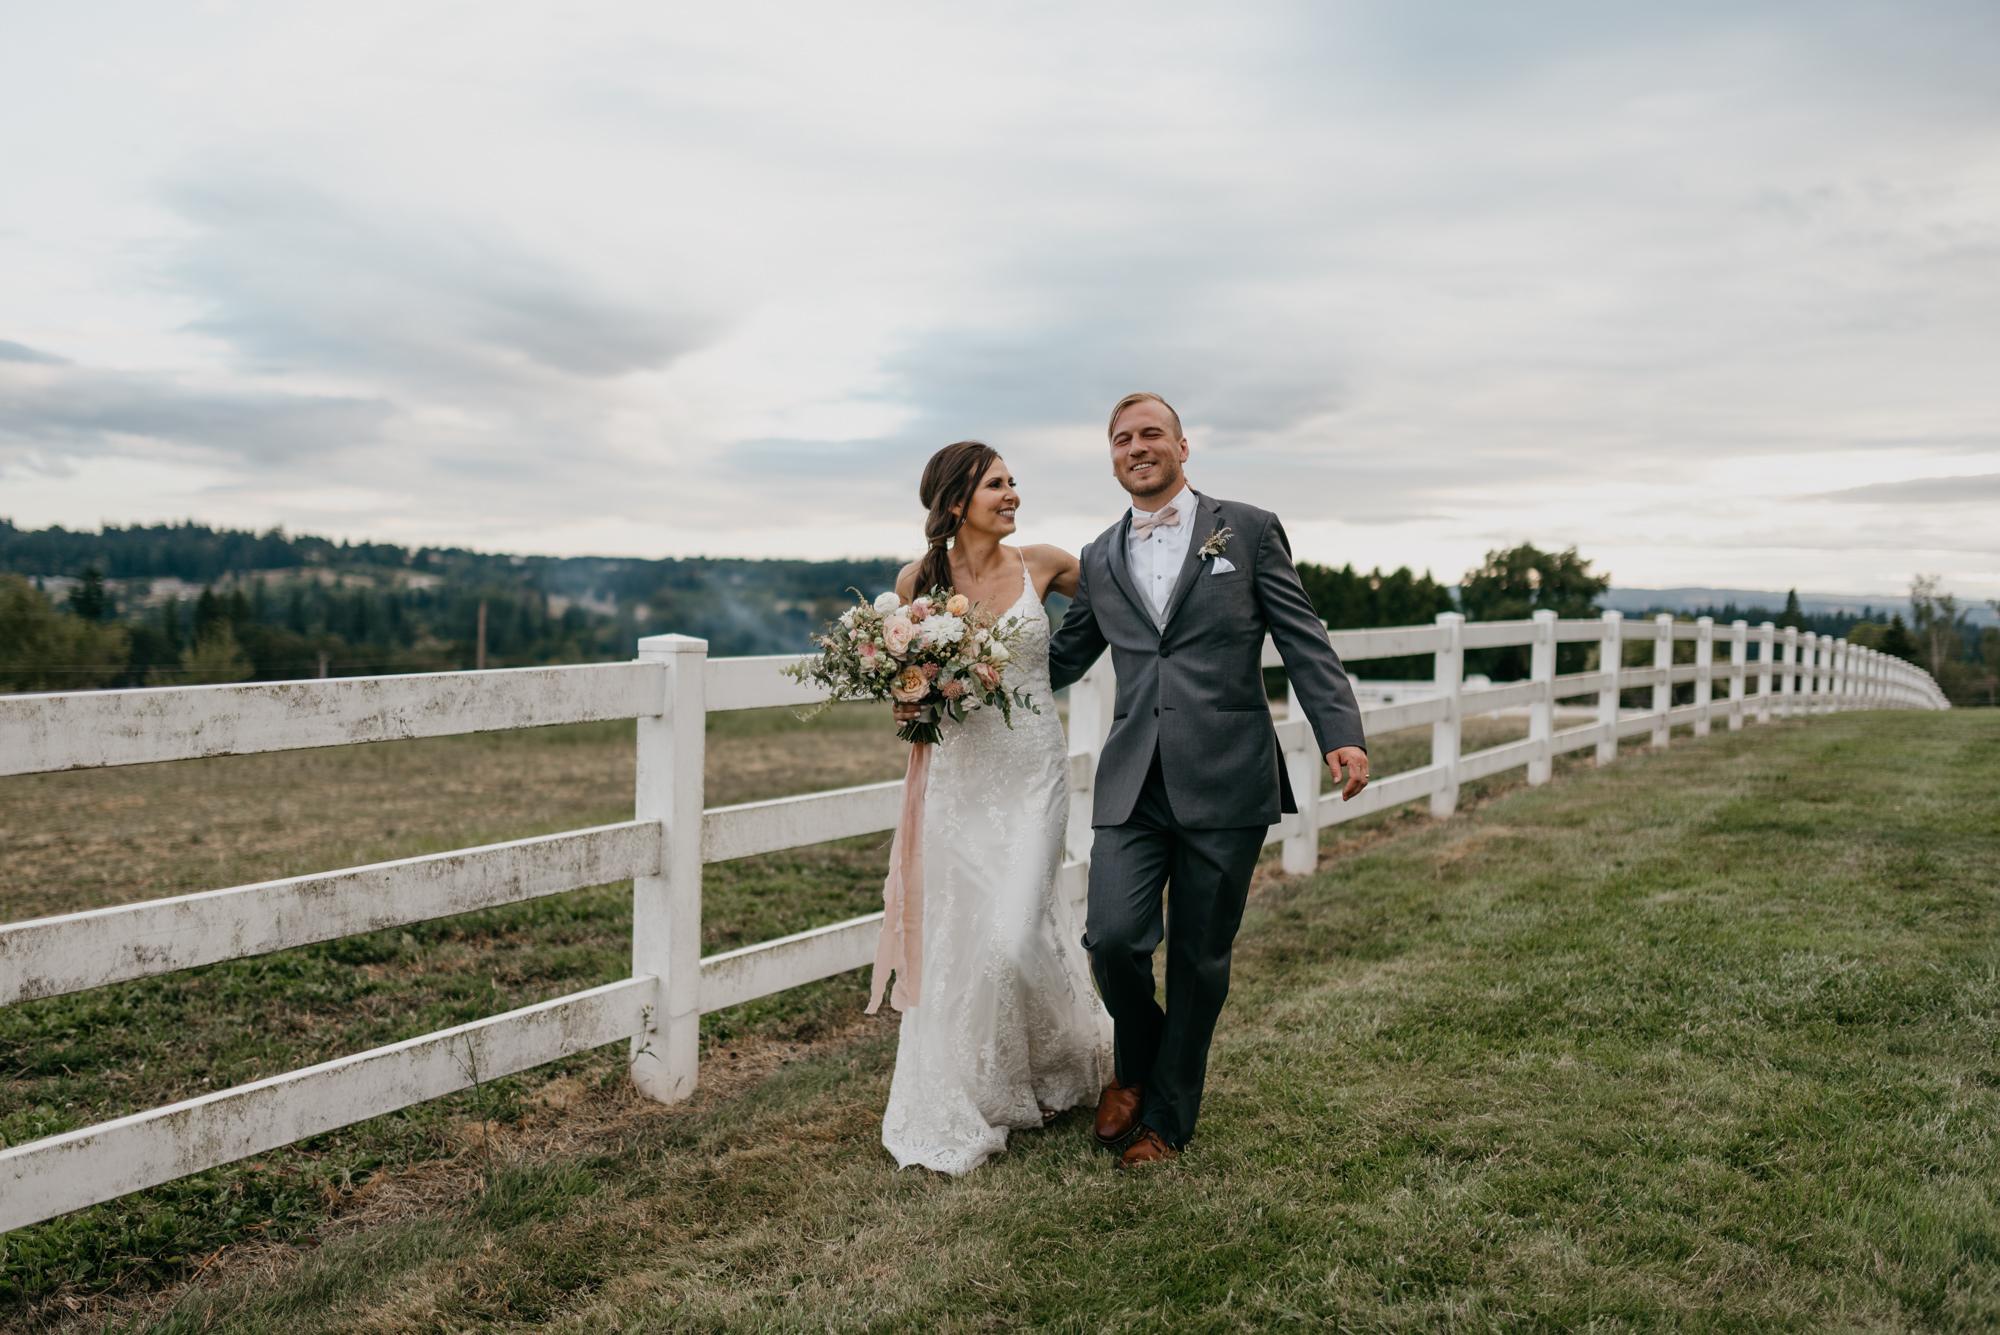 173-barn-kestrel-portland-northwest-horse-sunset-wedding.jpg